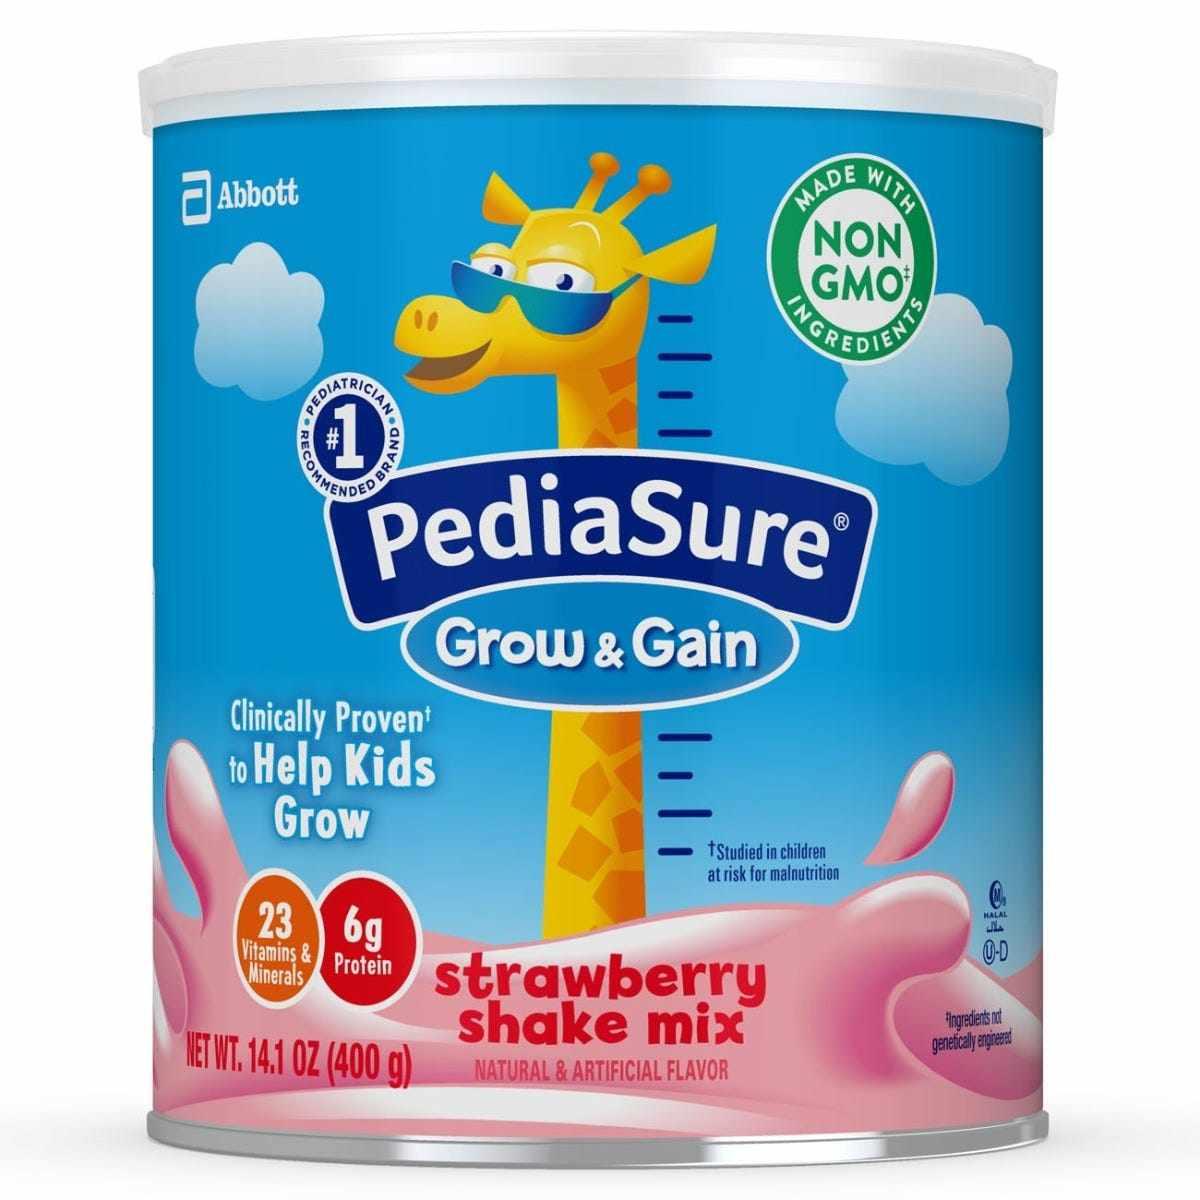 PediaSure Grow and Gain Complete Balanced Pediatric Nutrition